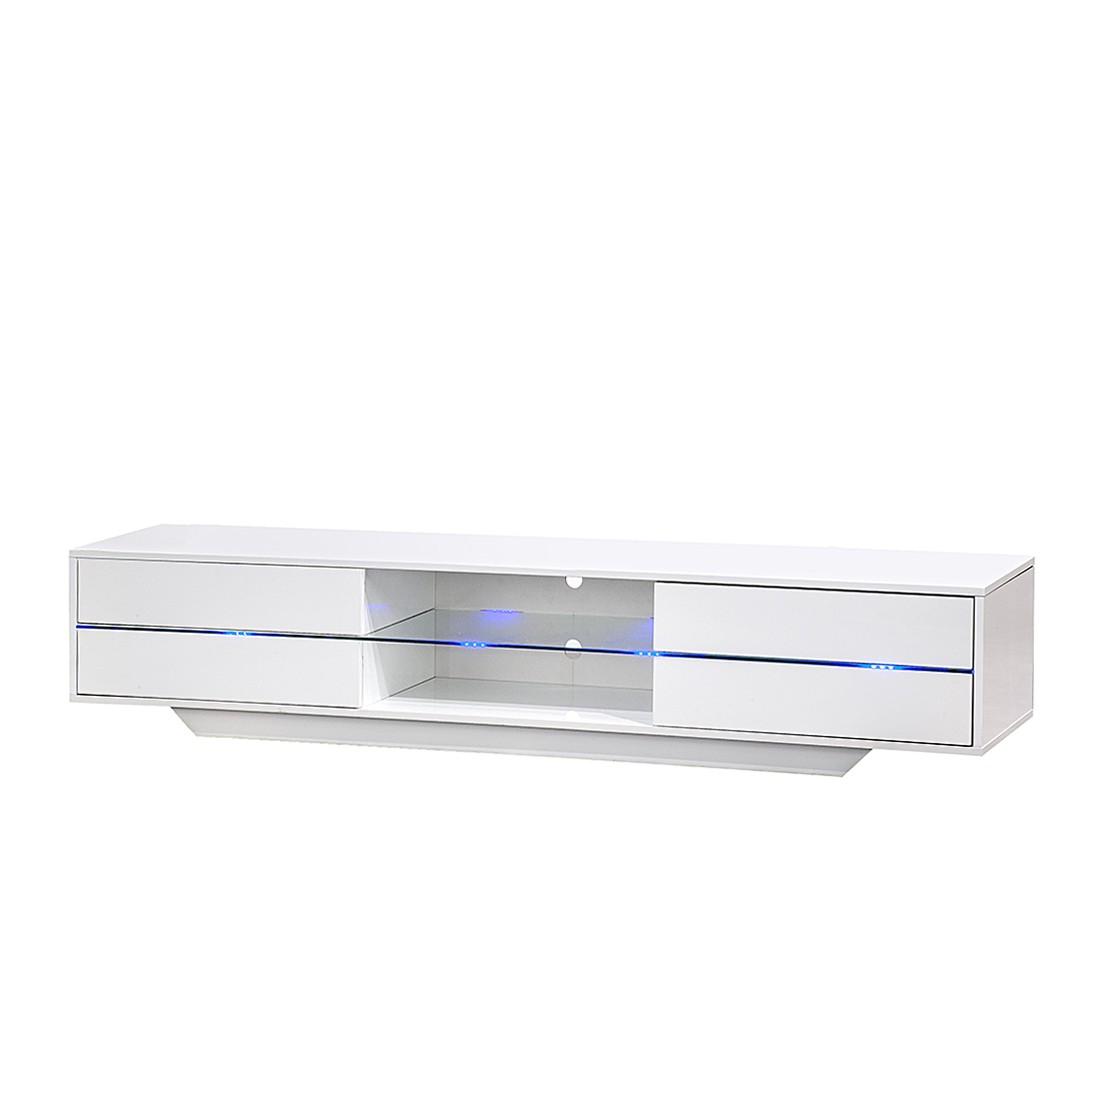 Tv-meubel Claire - met RGB-LED-verlichting kado